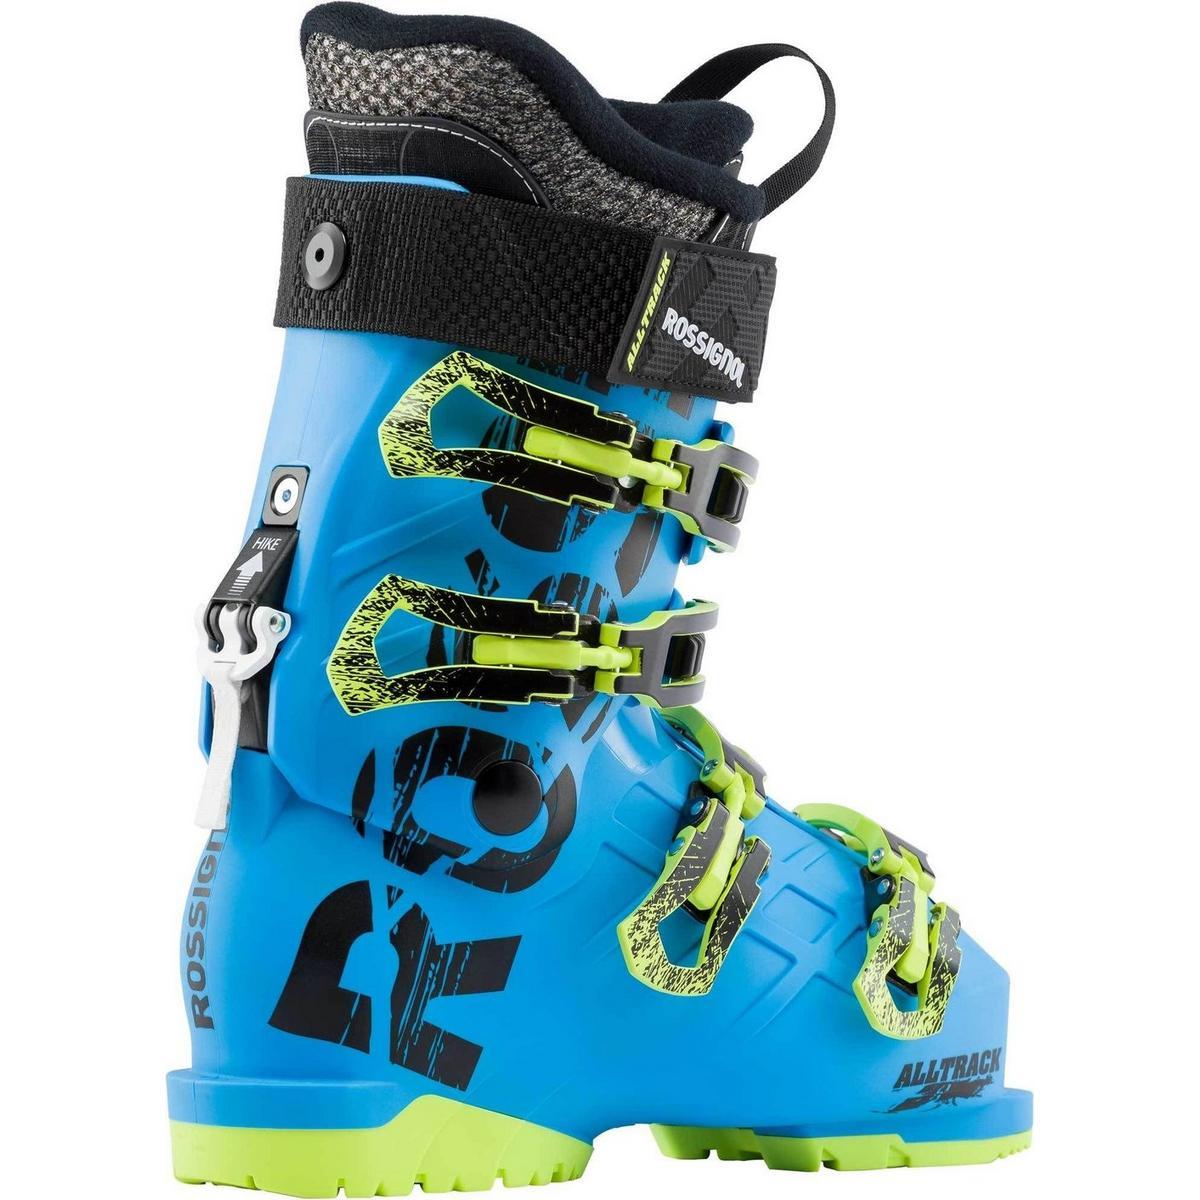 Rossignol Alltrack 80 Junior Ski Boot - Blue